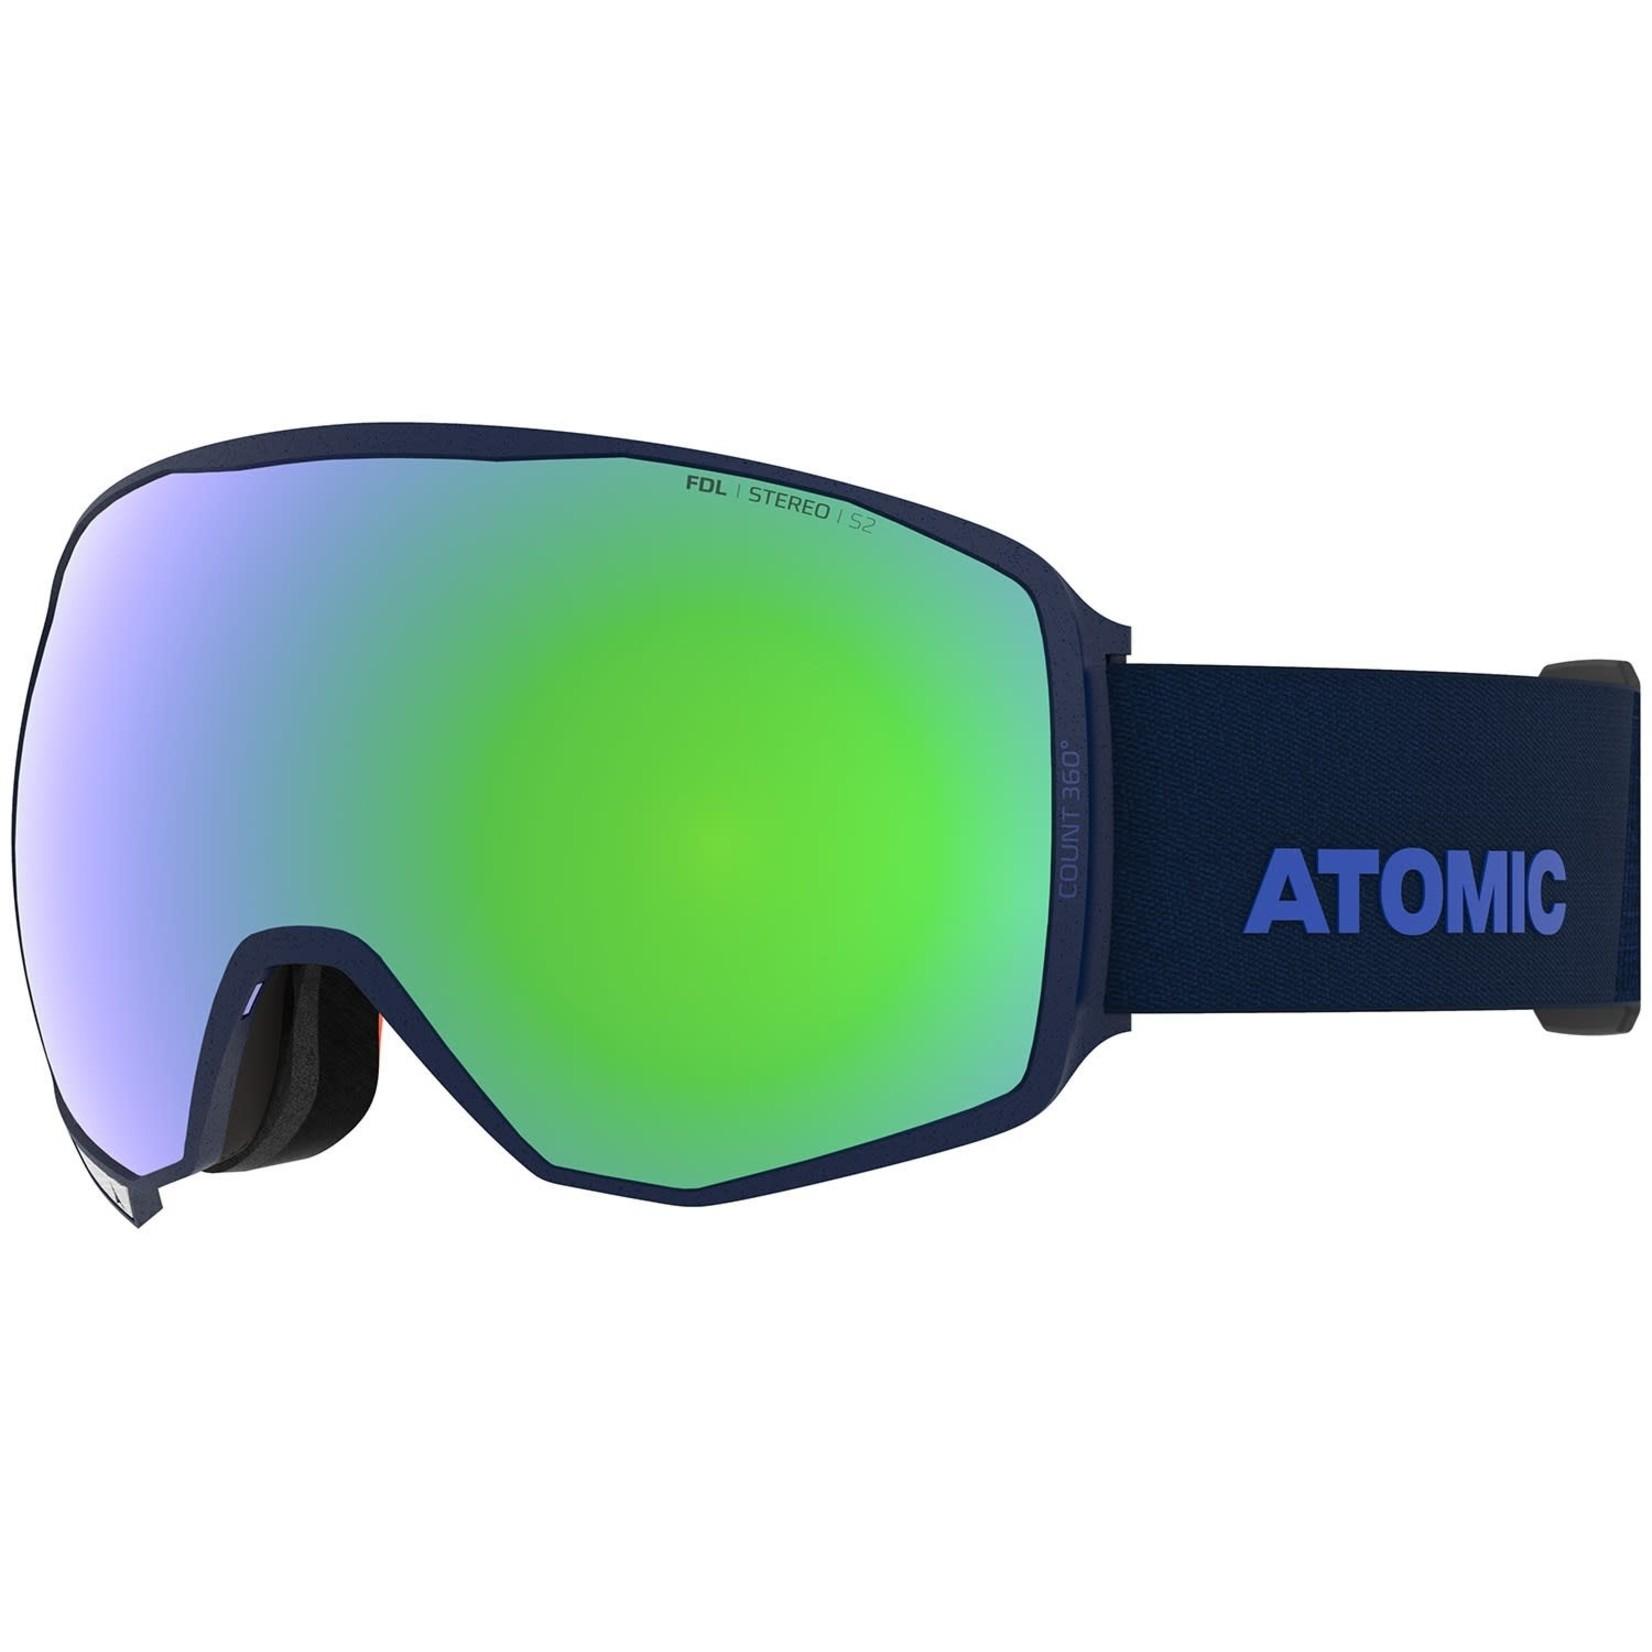 Atomic Lunette de ski Atomic Count 360 Stereo - Unisexe